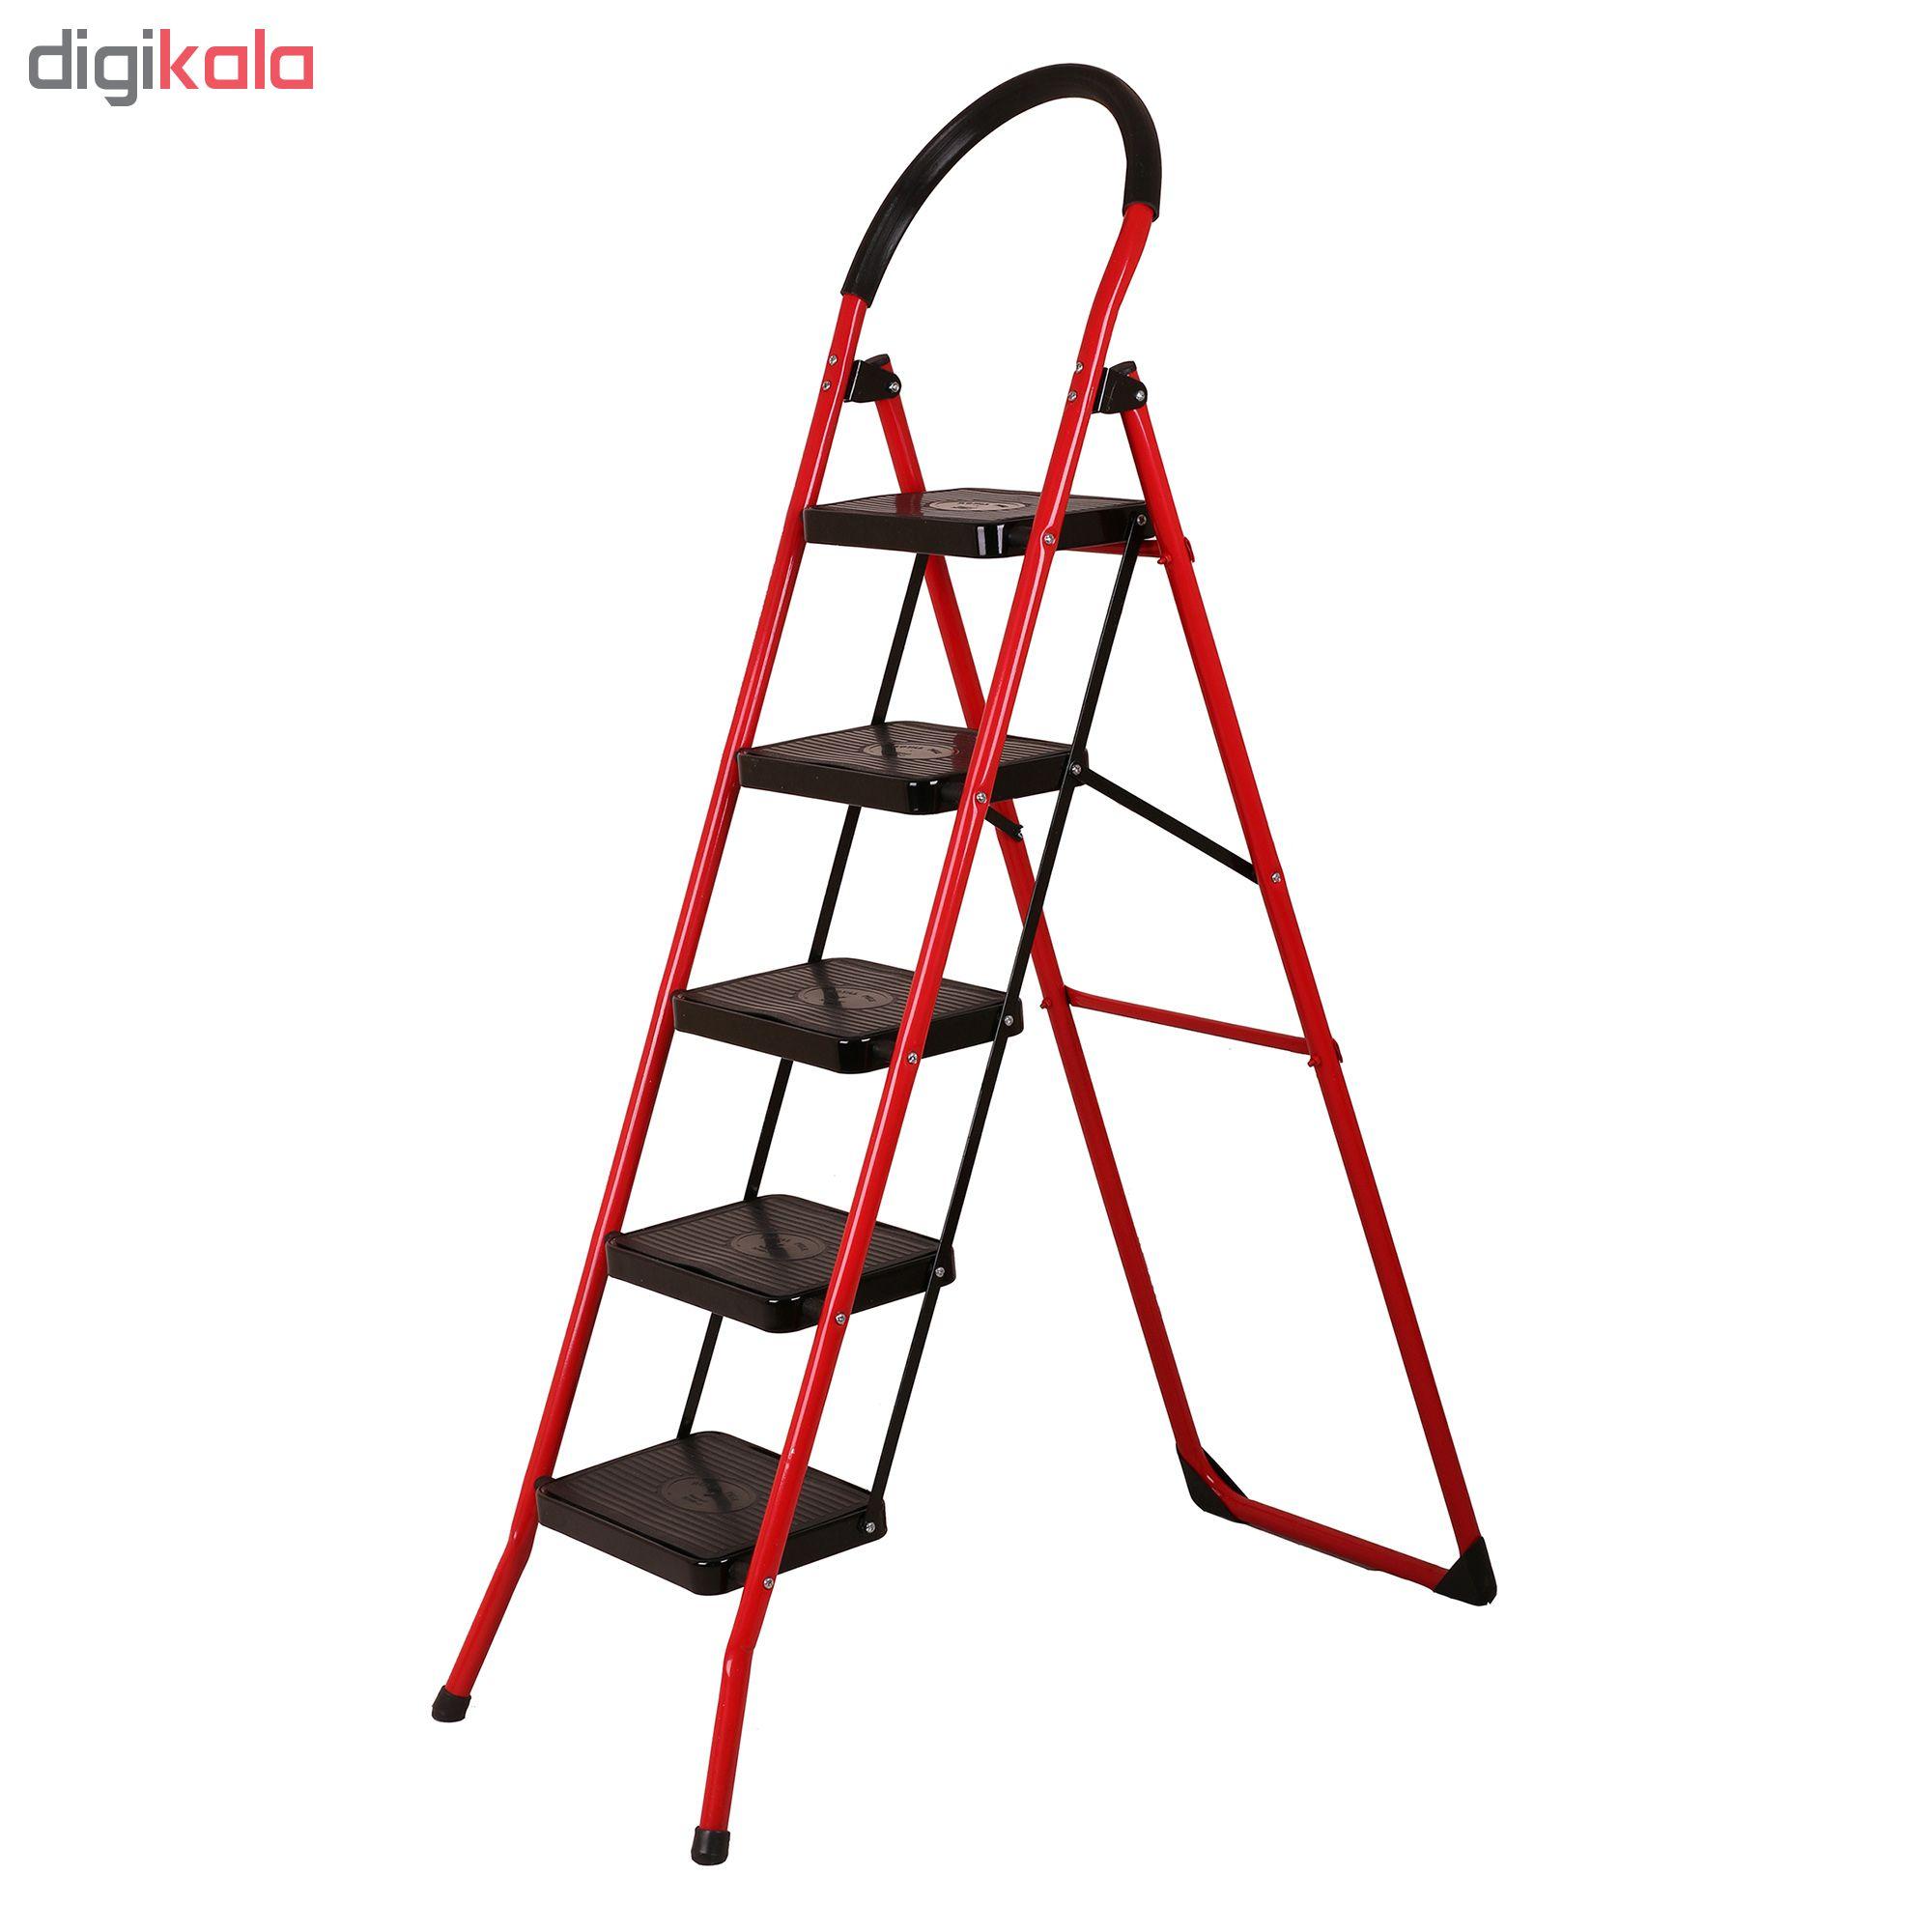 نردبان 5 پله رویال کد 006 main 1 2